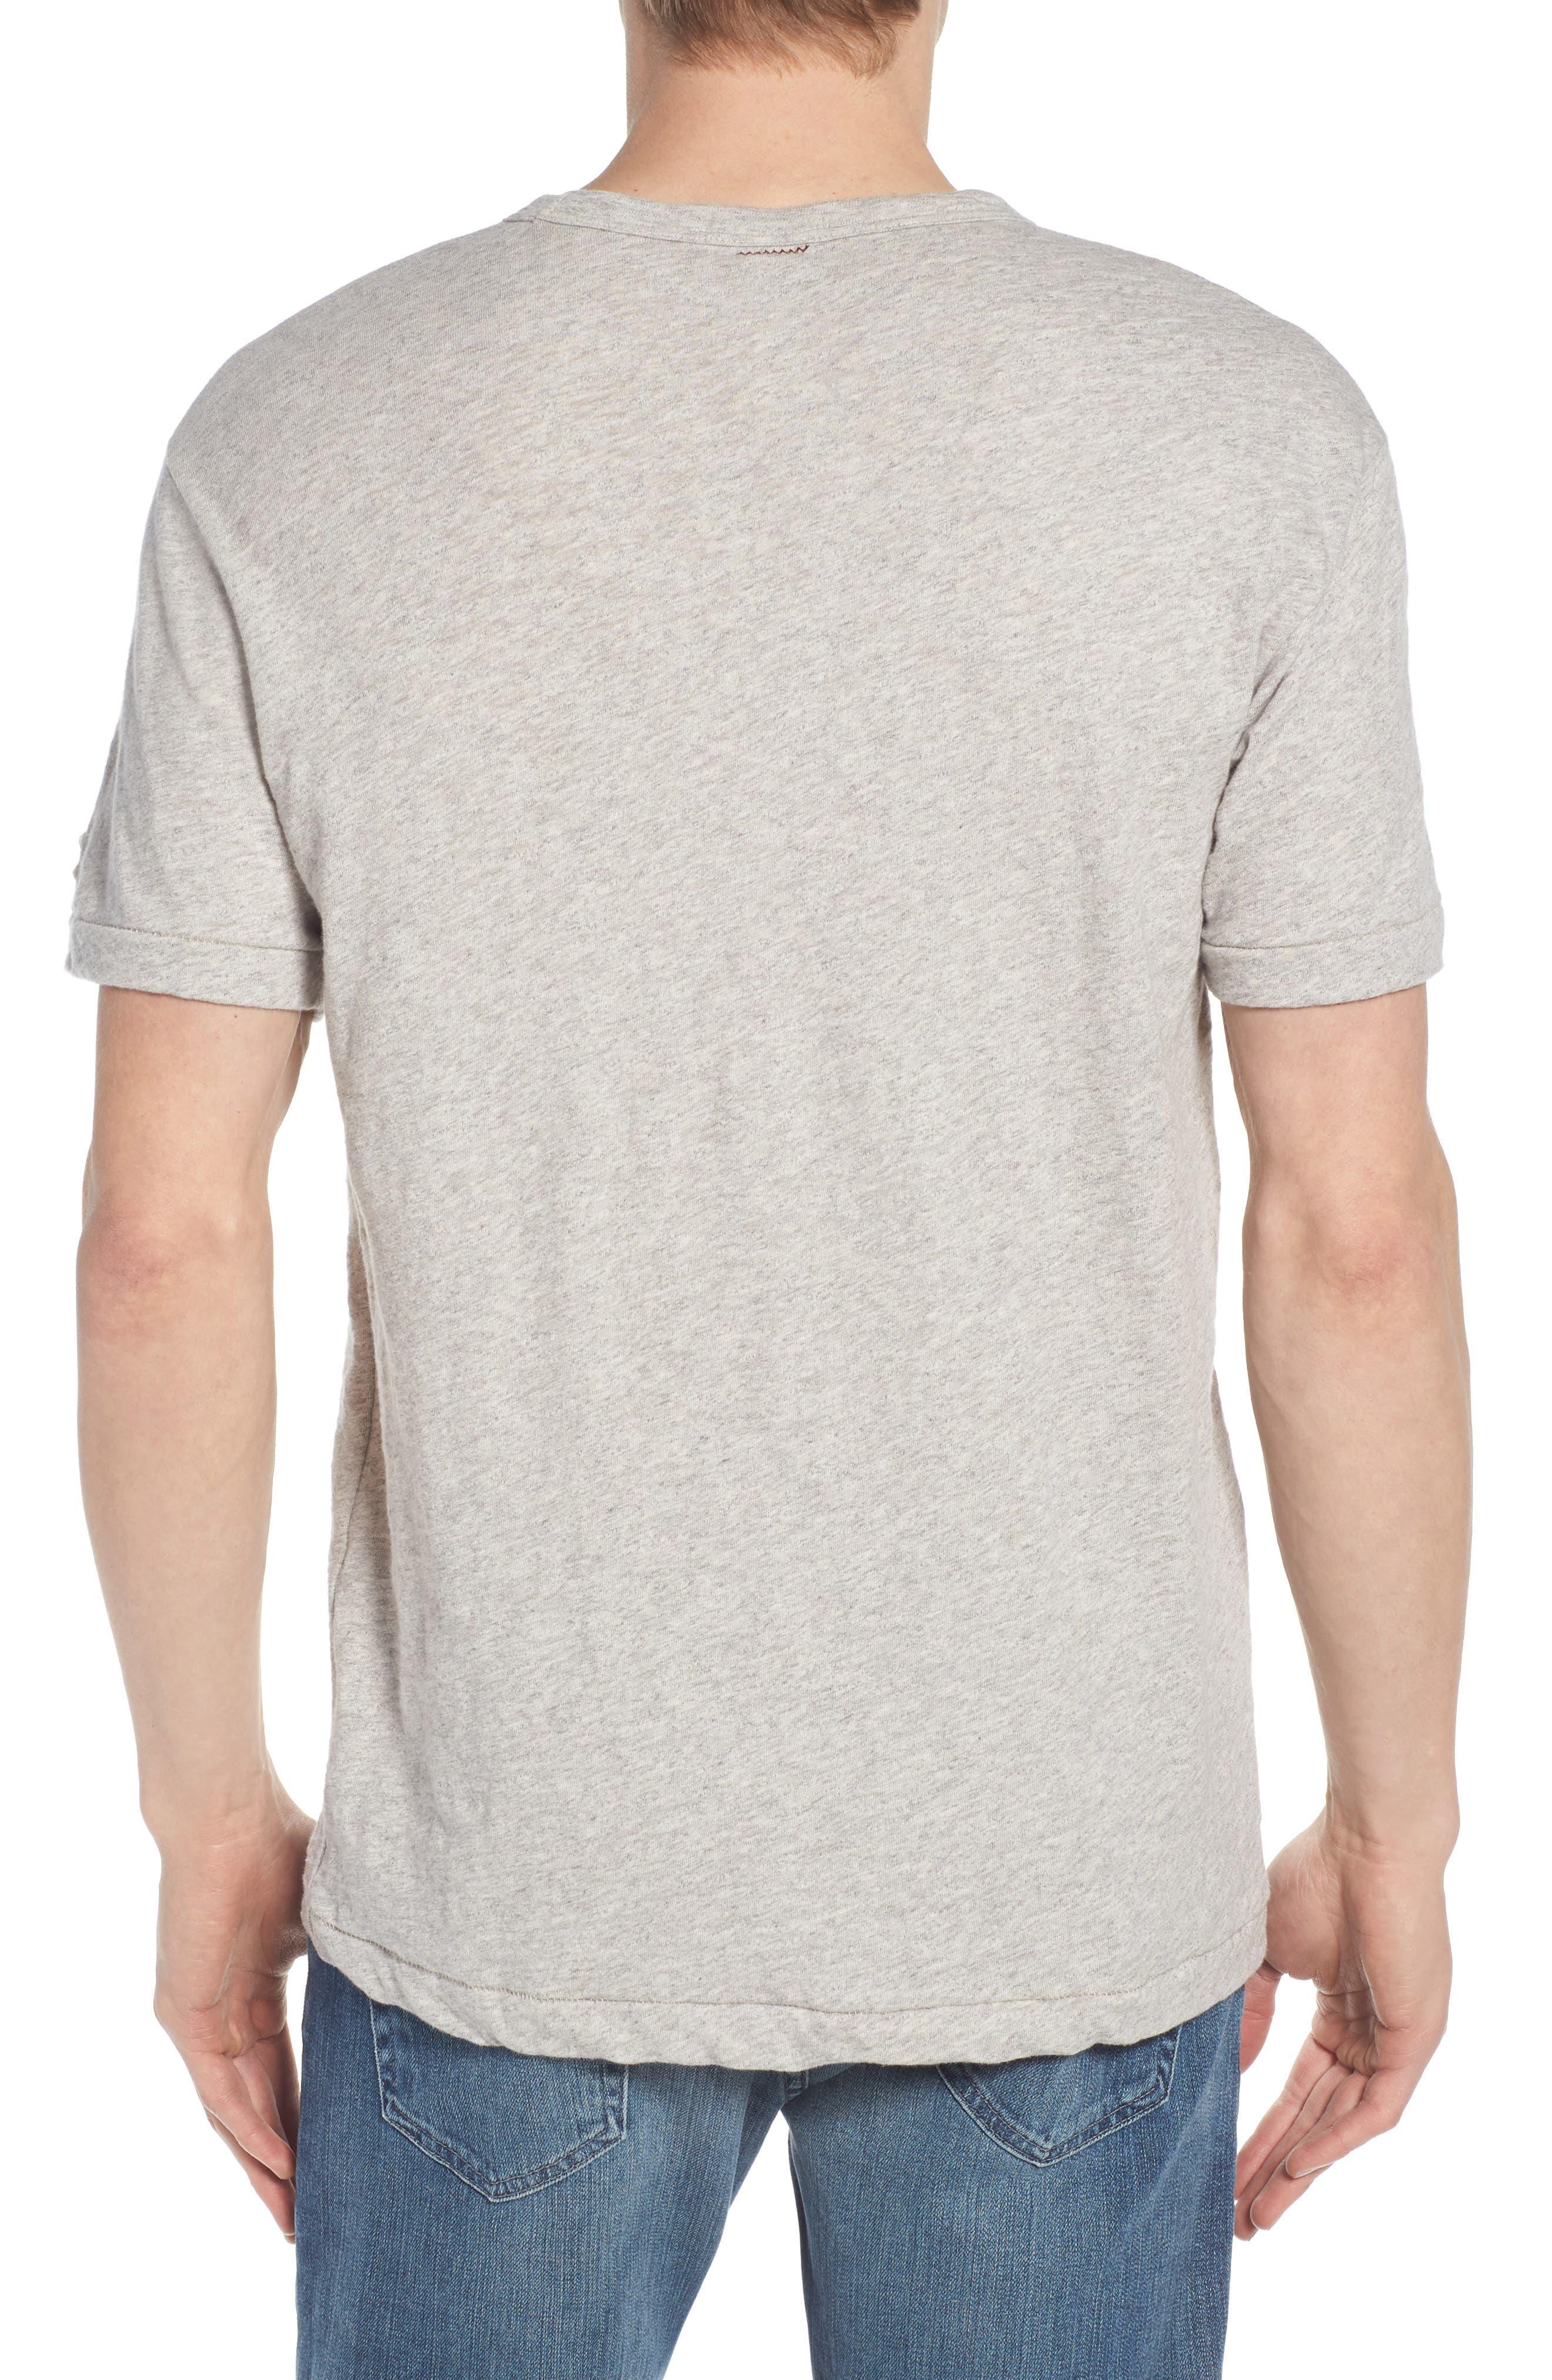 + Champion Heathered Crewneck T-Shirt,                             Alternate thumbnail 2, color,                             Antique Grey Mix